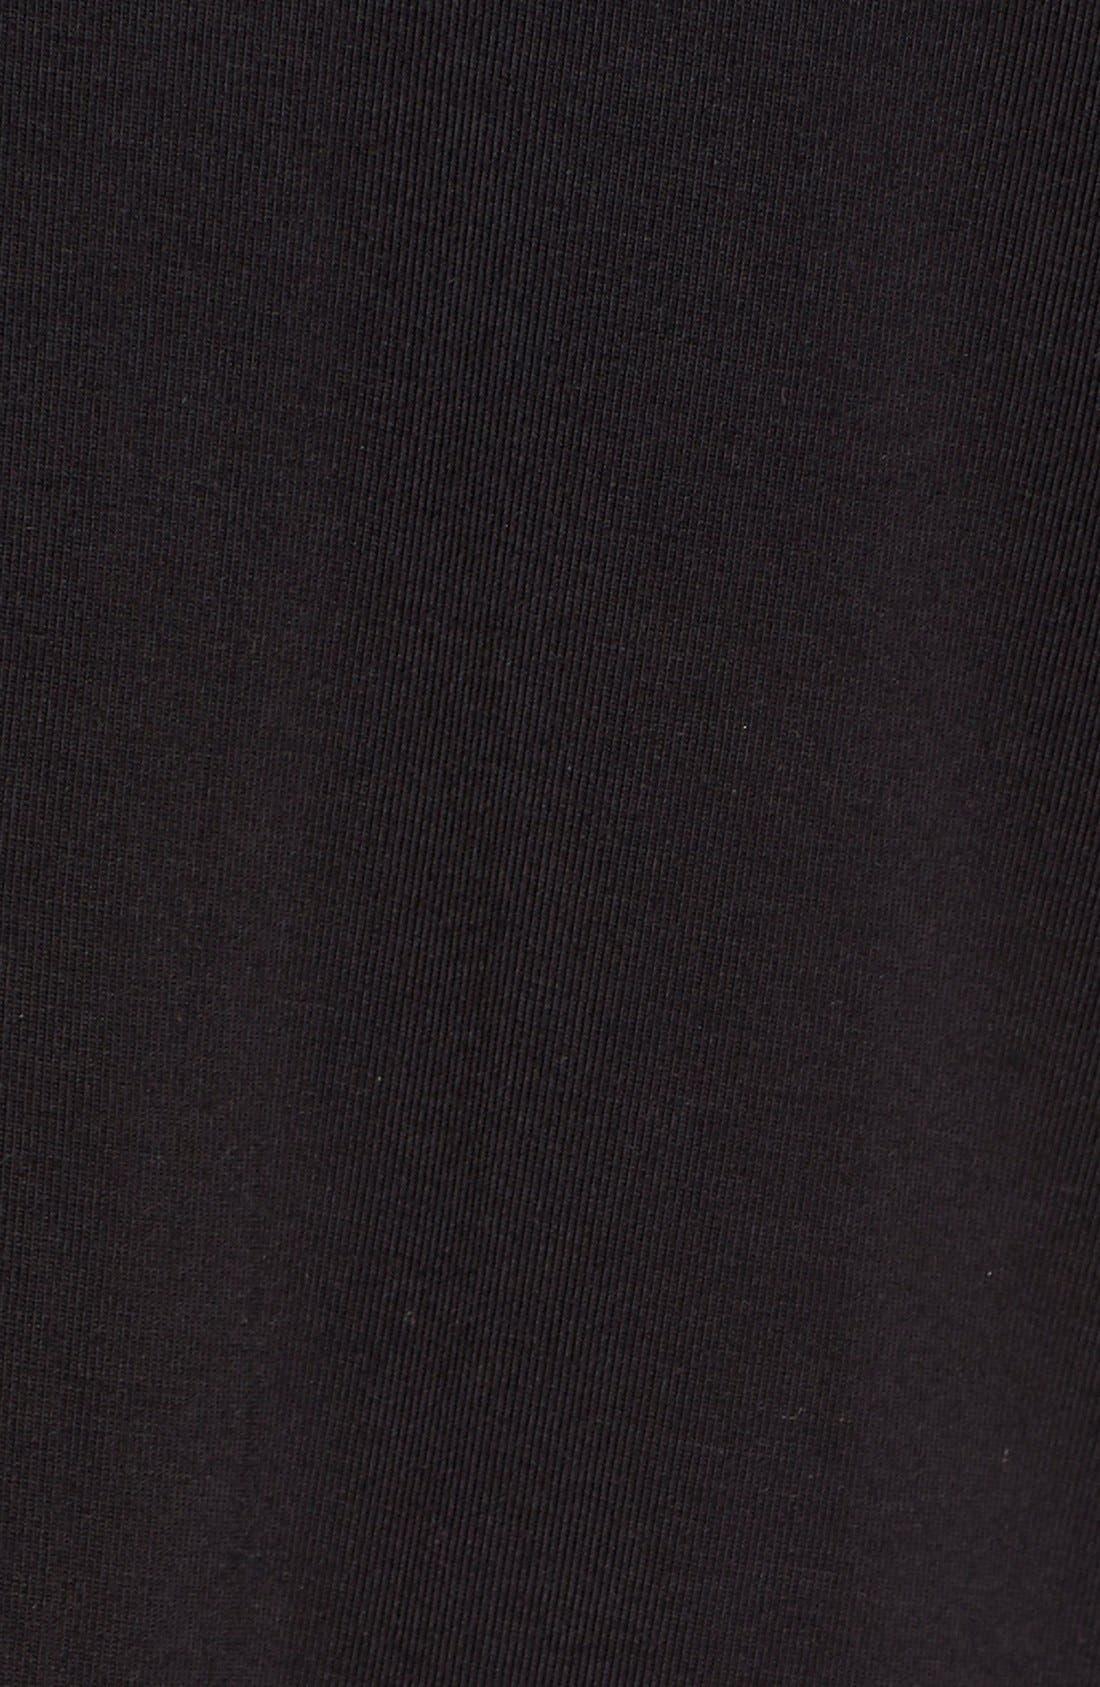 'Moonlight' Short Pajamas,                             Alternate thumbnail 10, color,                             001